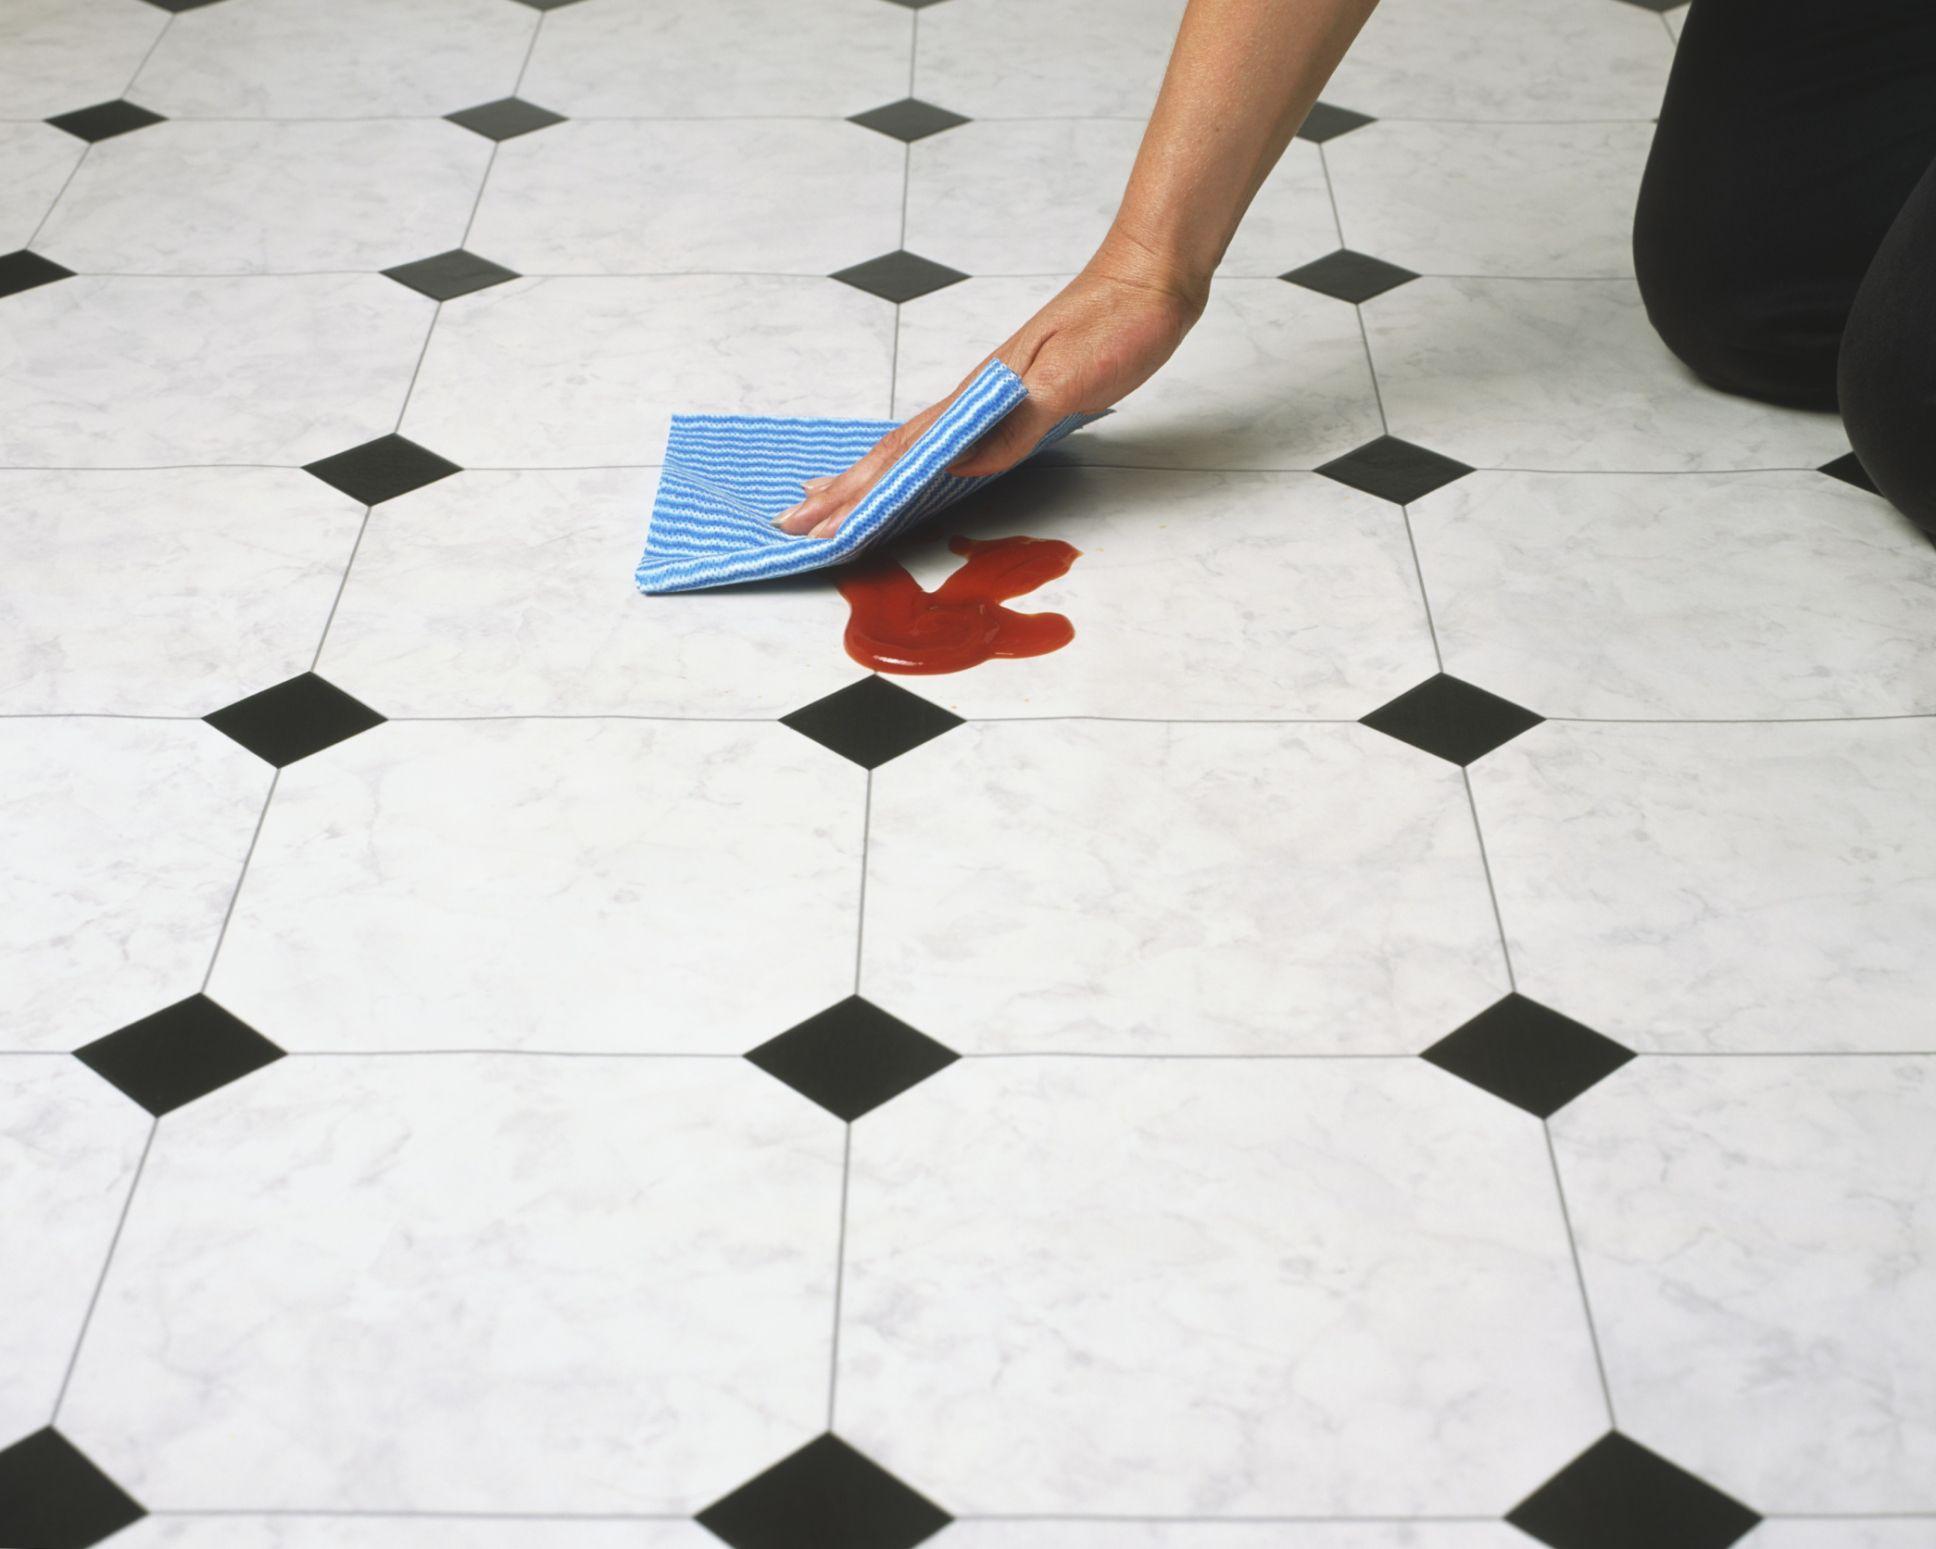 Vinyl versus linoleum flooring a look at the eco friendly benefits of natural linoleum floors dailygadgetfo Choice Image